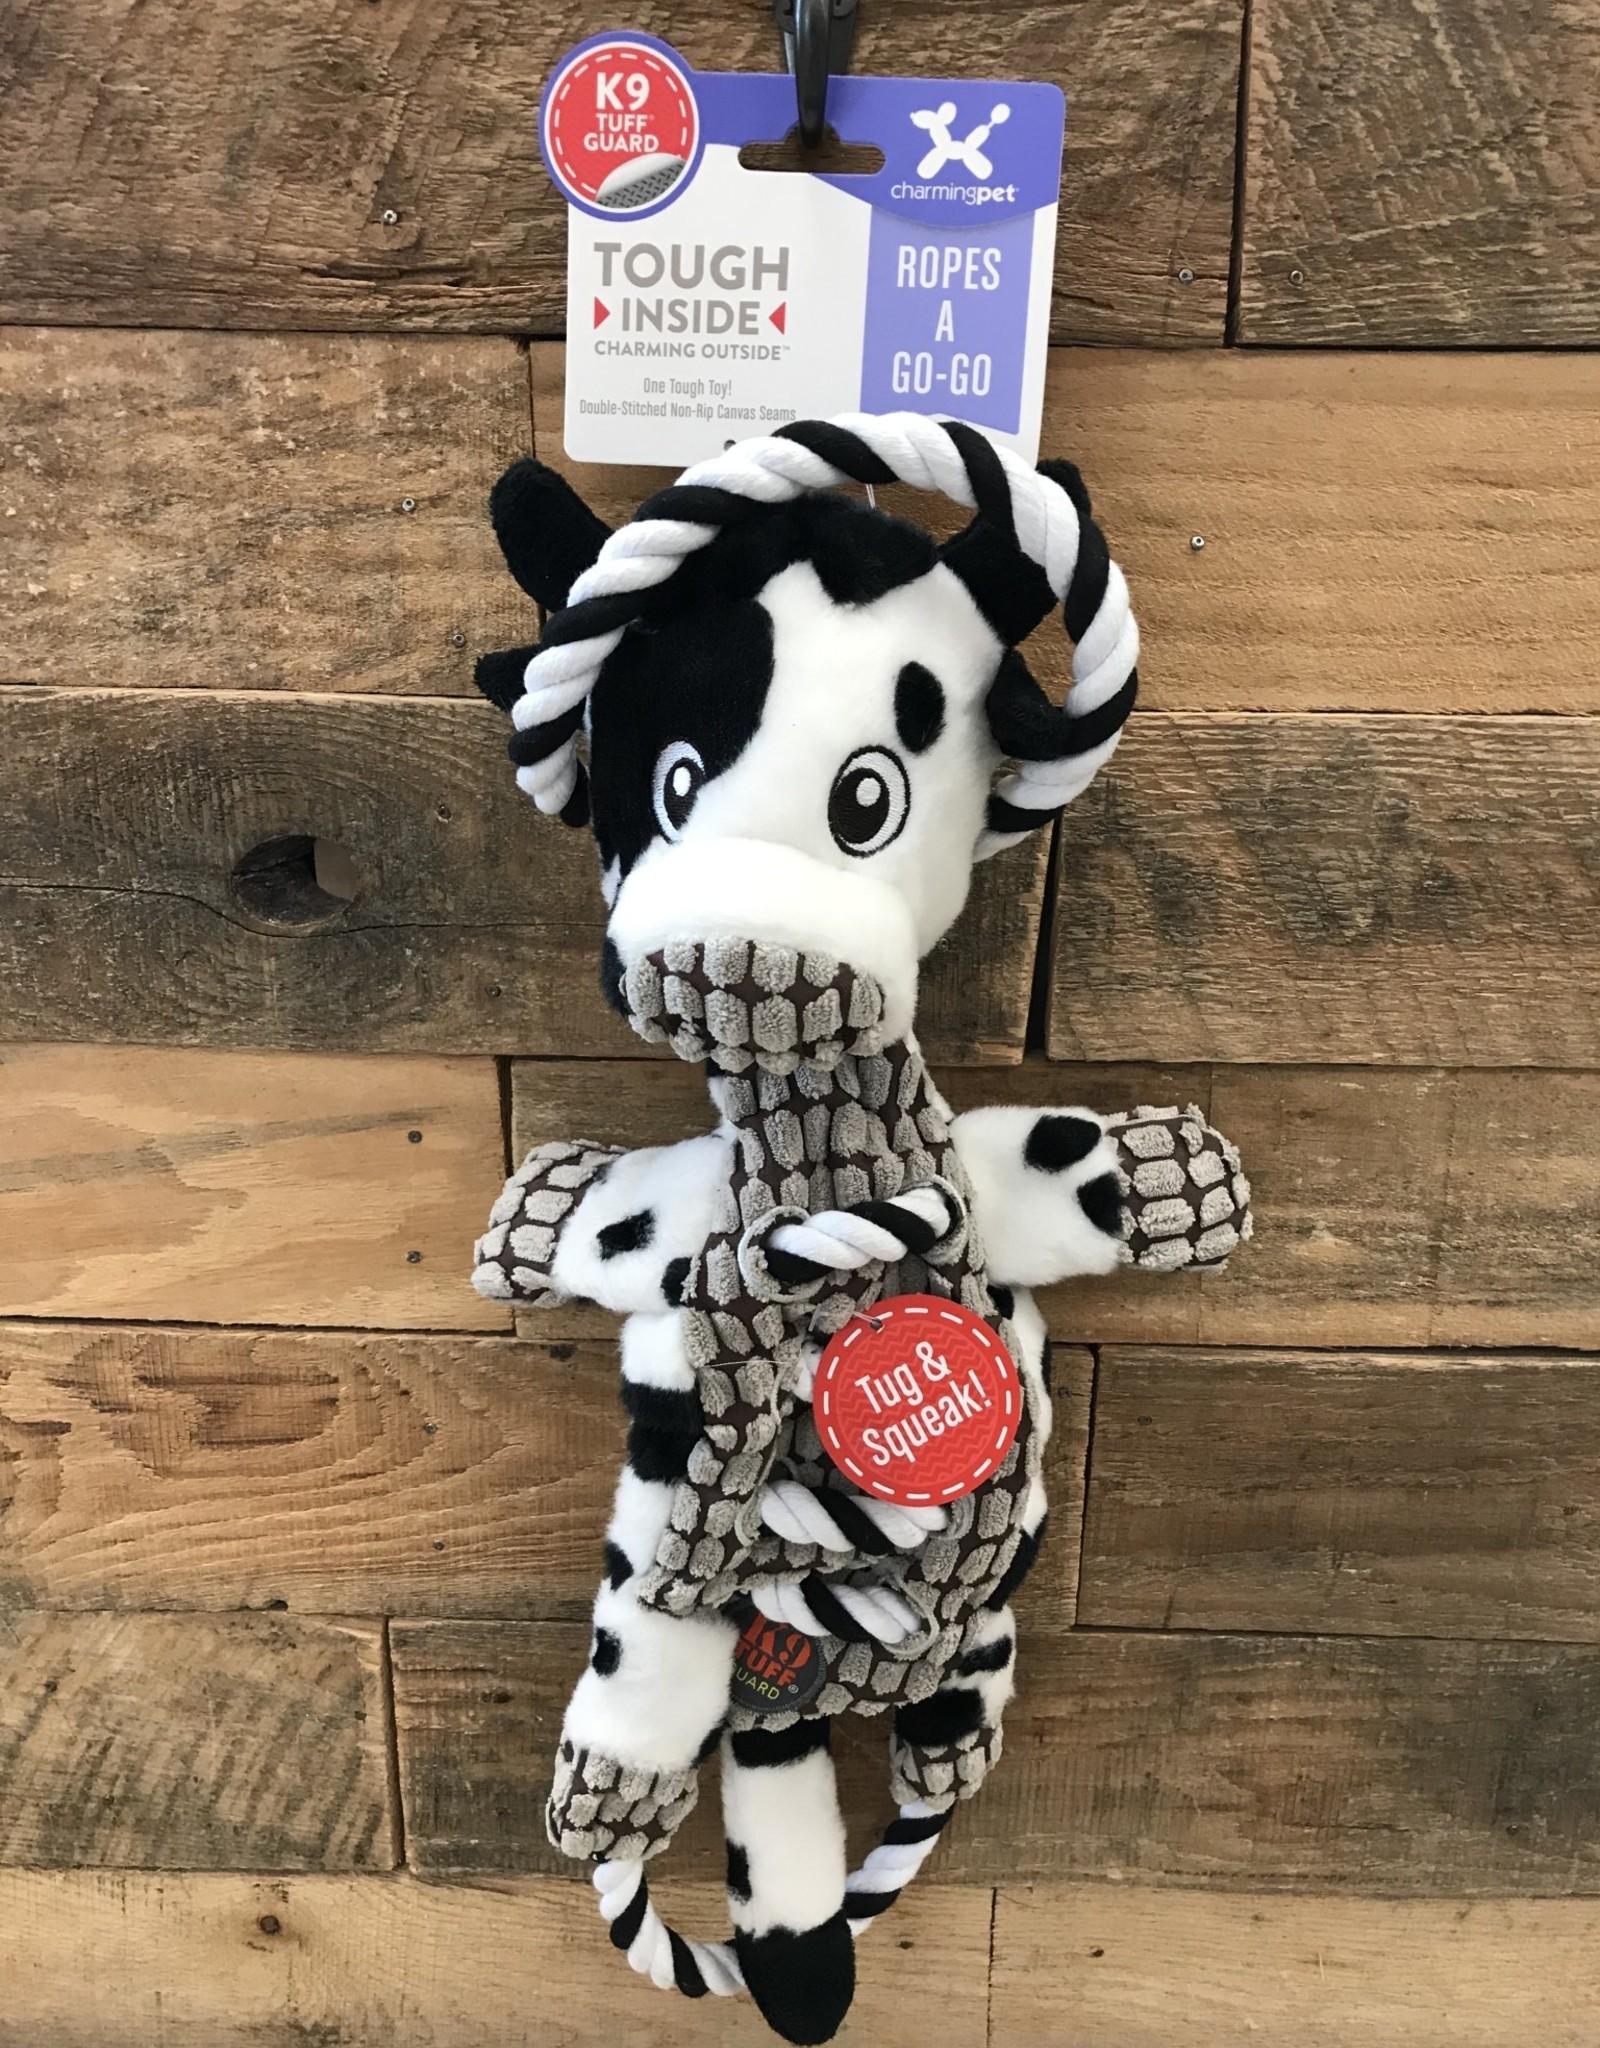 Outward Hound - Charming Pet Charming Pet Ropes-A-Go-Go Cow